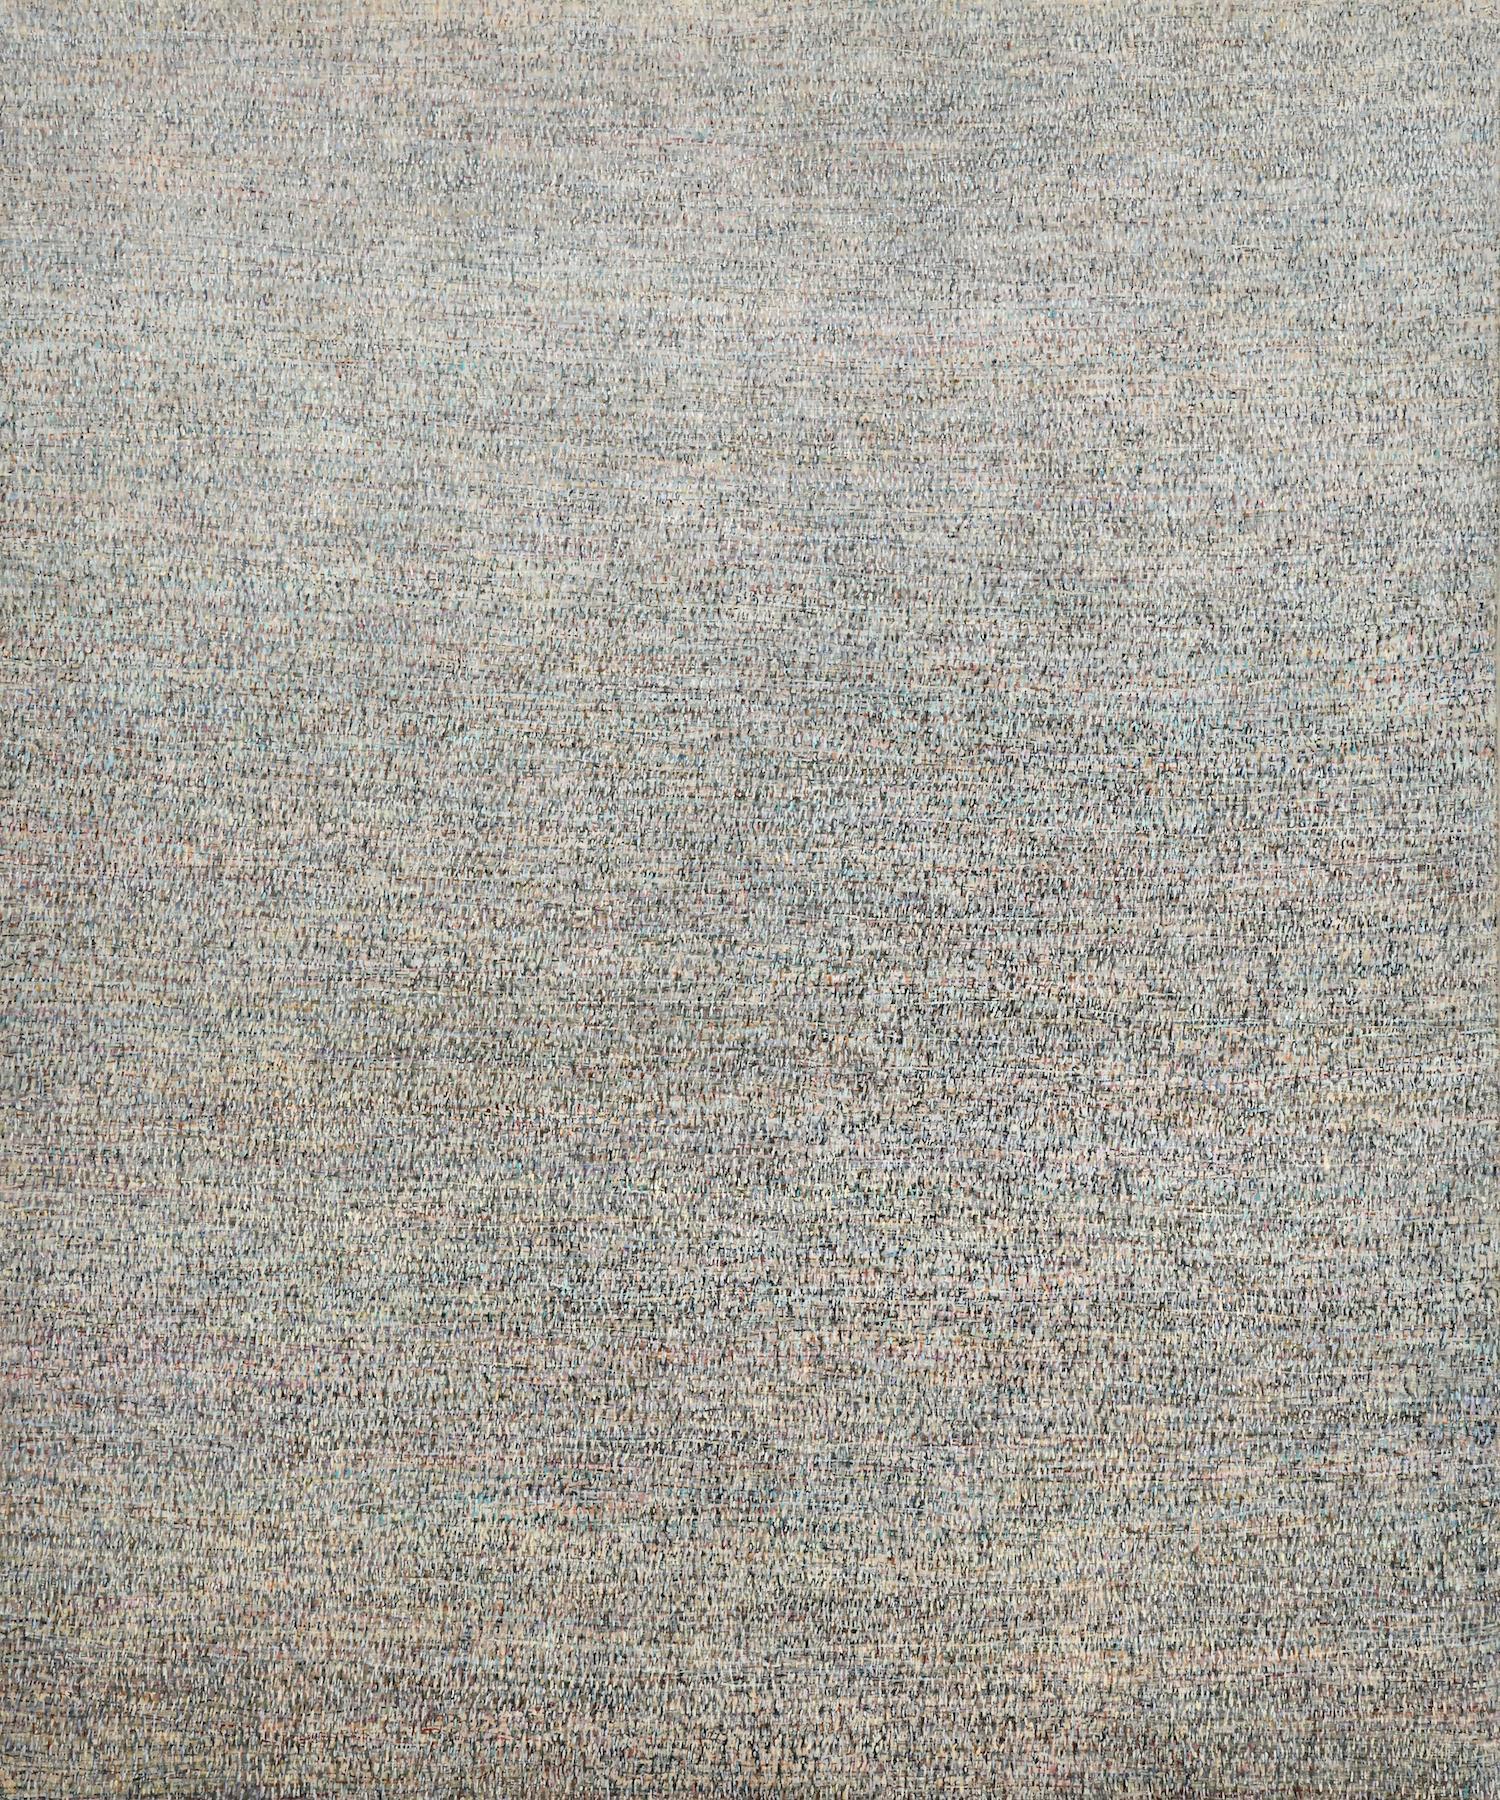 Good Morning - Large Format Painting, Modern, Minimalistic,  Contemplative